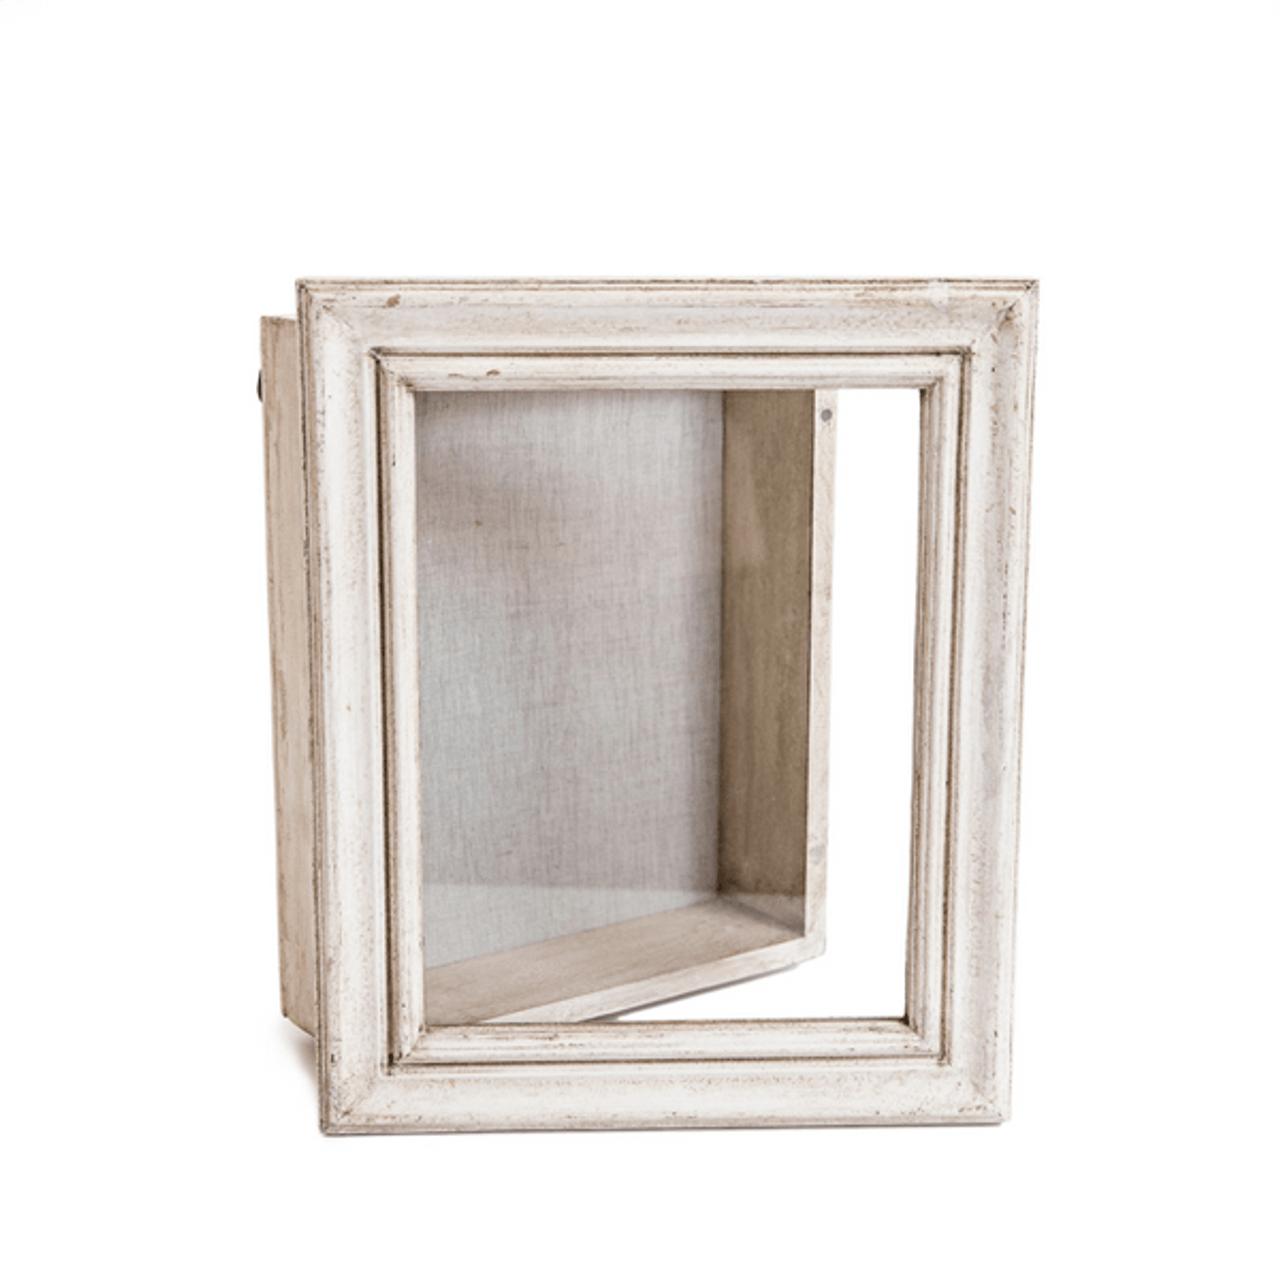 wood and glass shadow box